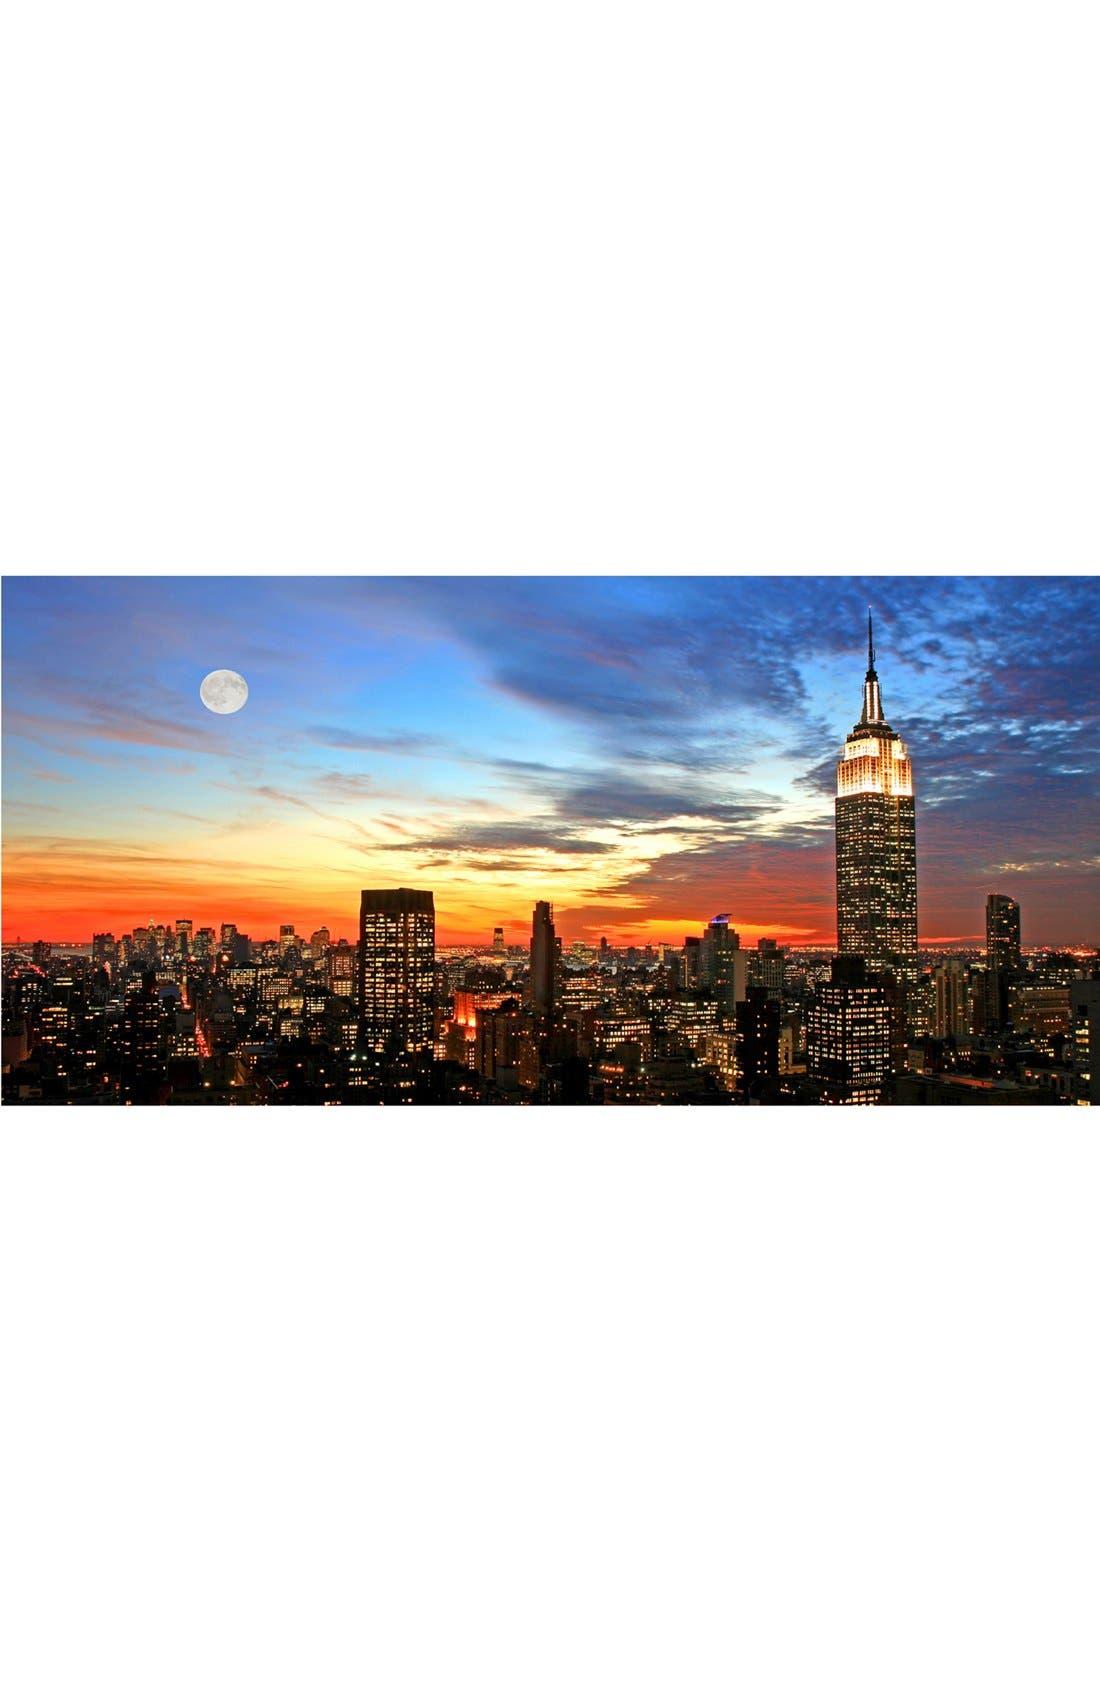 Alternate Image 1 Selected - Wallpops 'City Sunset - Mega Panoramic' Wall Art